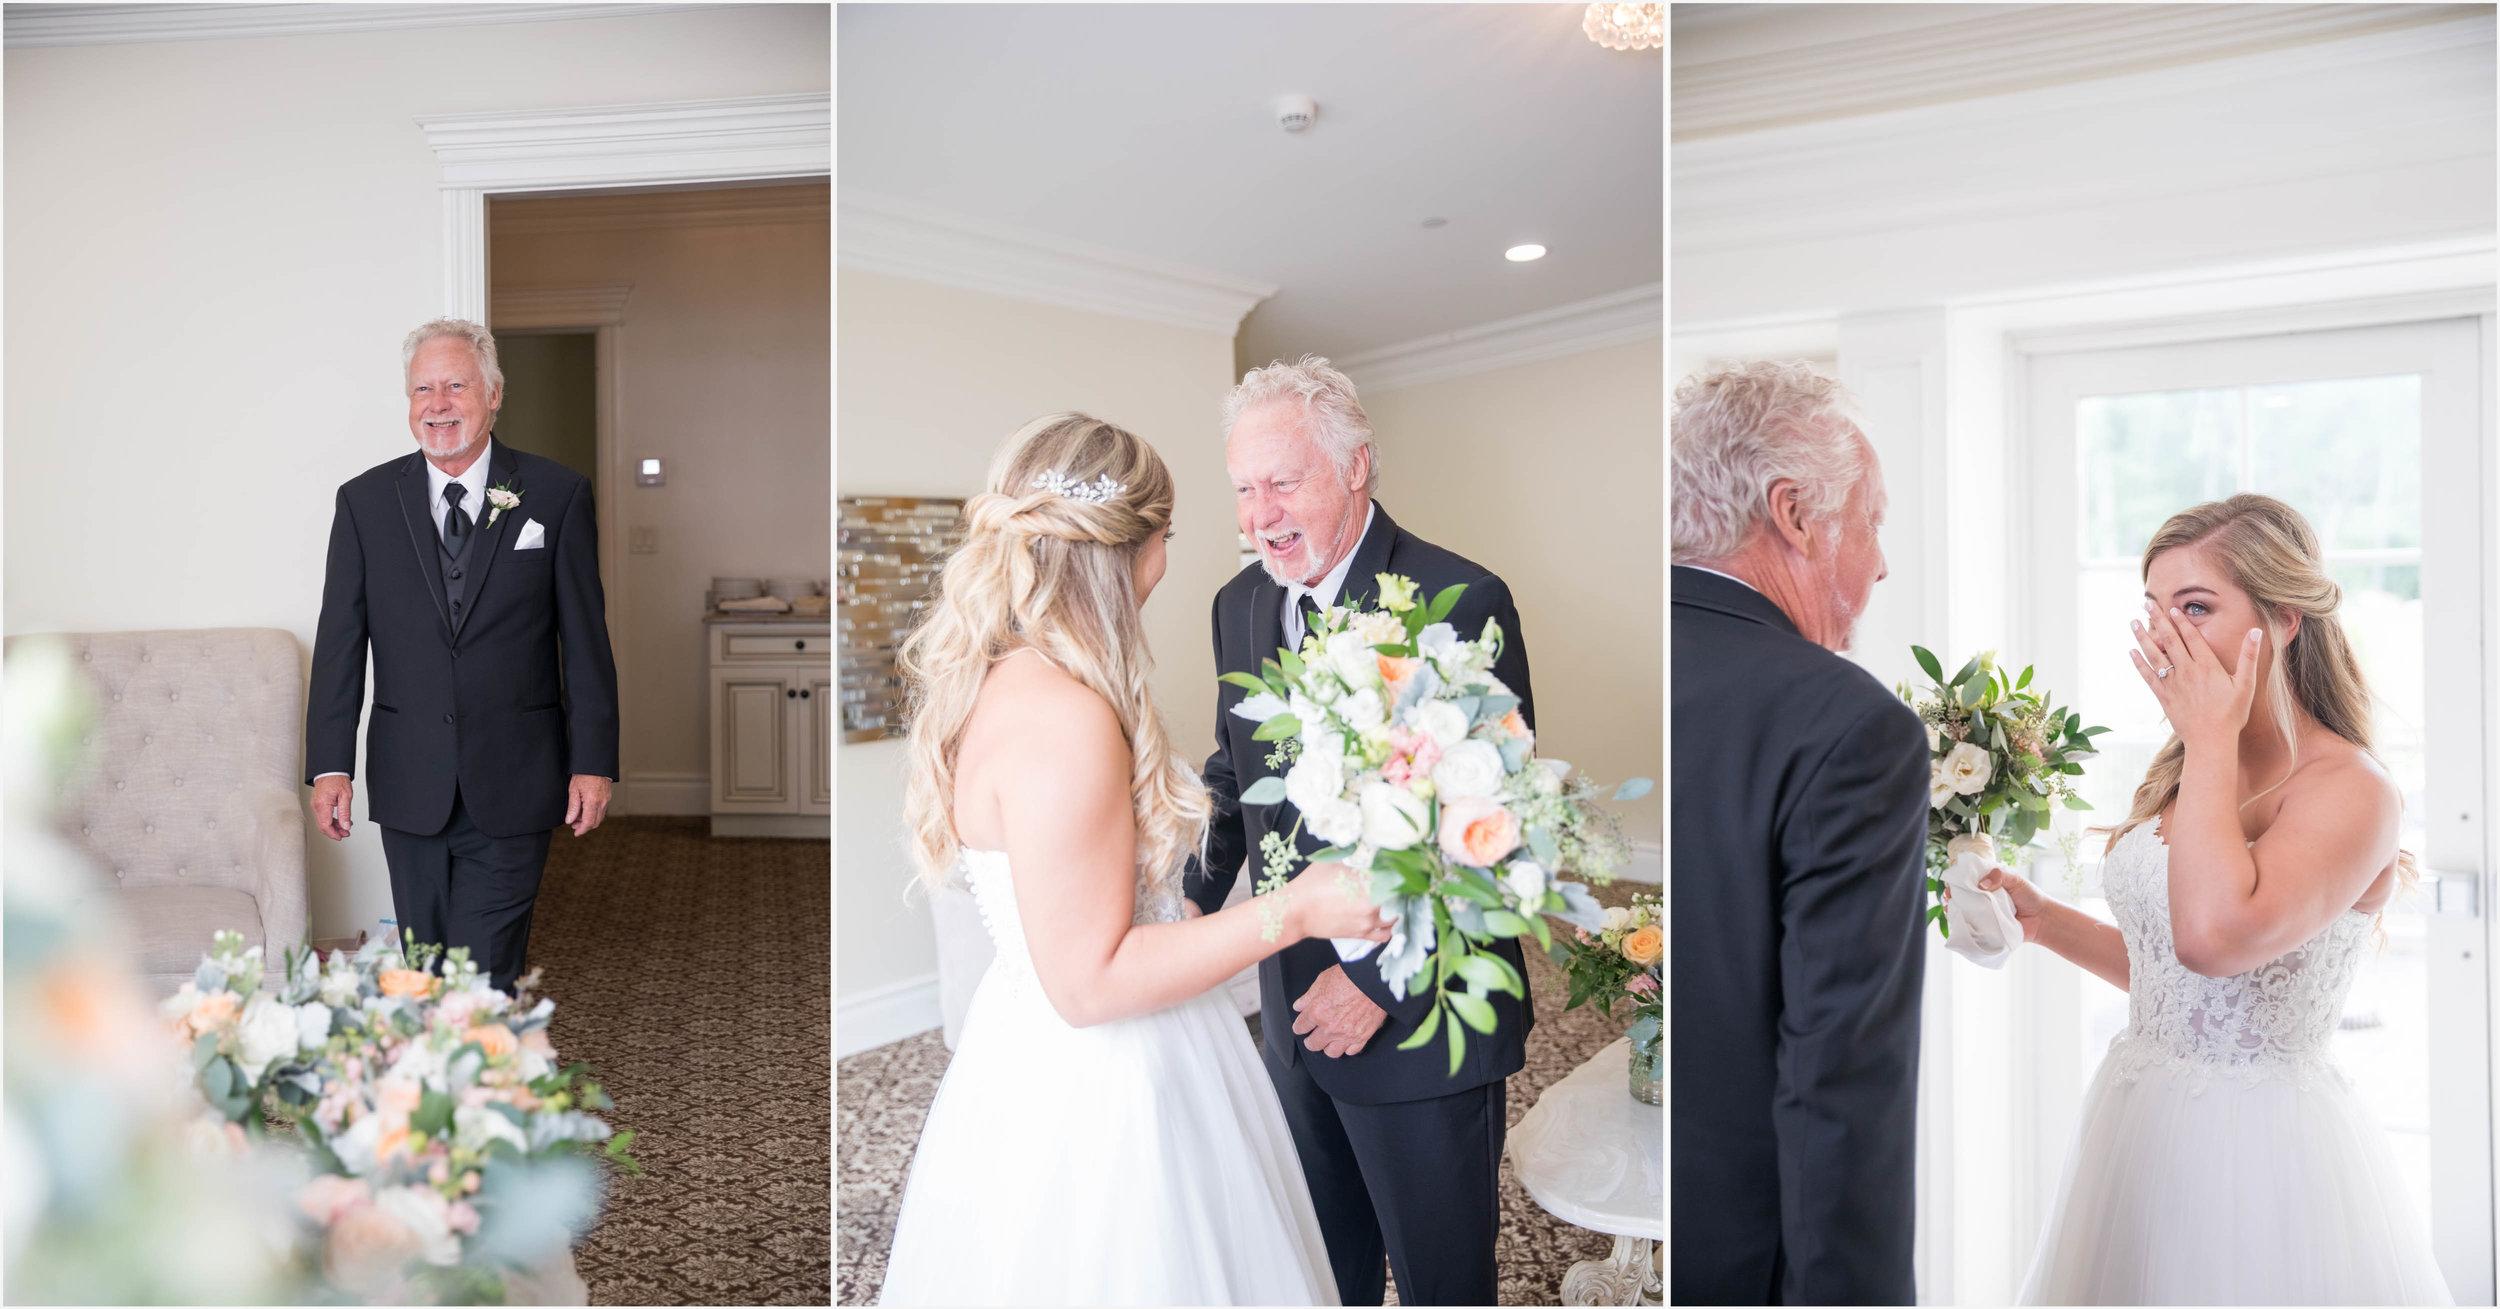 Cassondre Mae Photography Hudson Valley NY Wedding Photographer -8.jpg